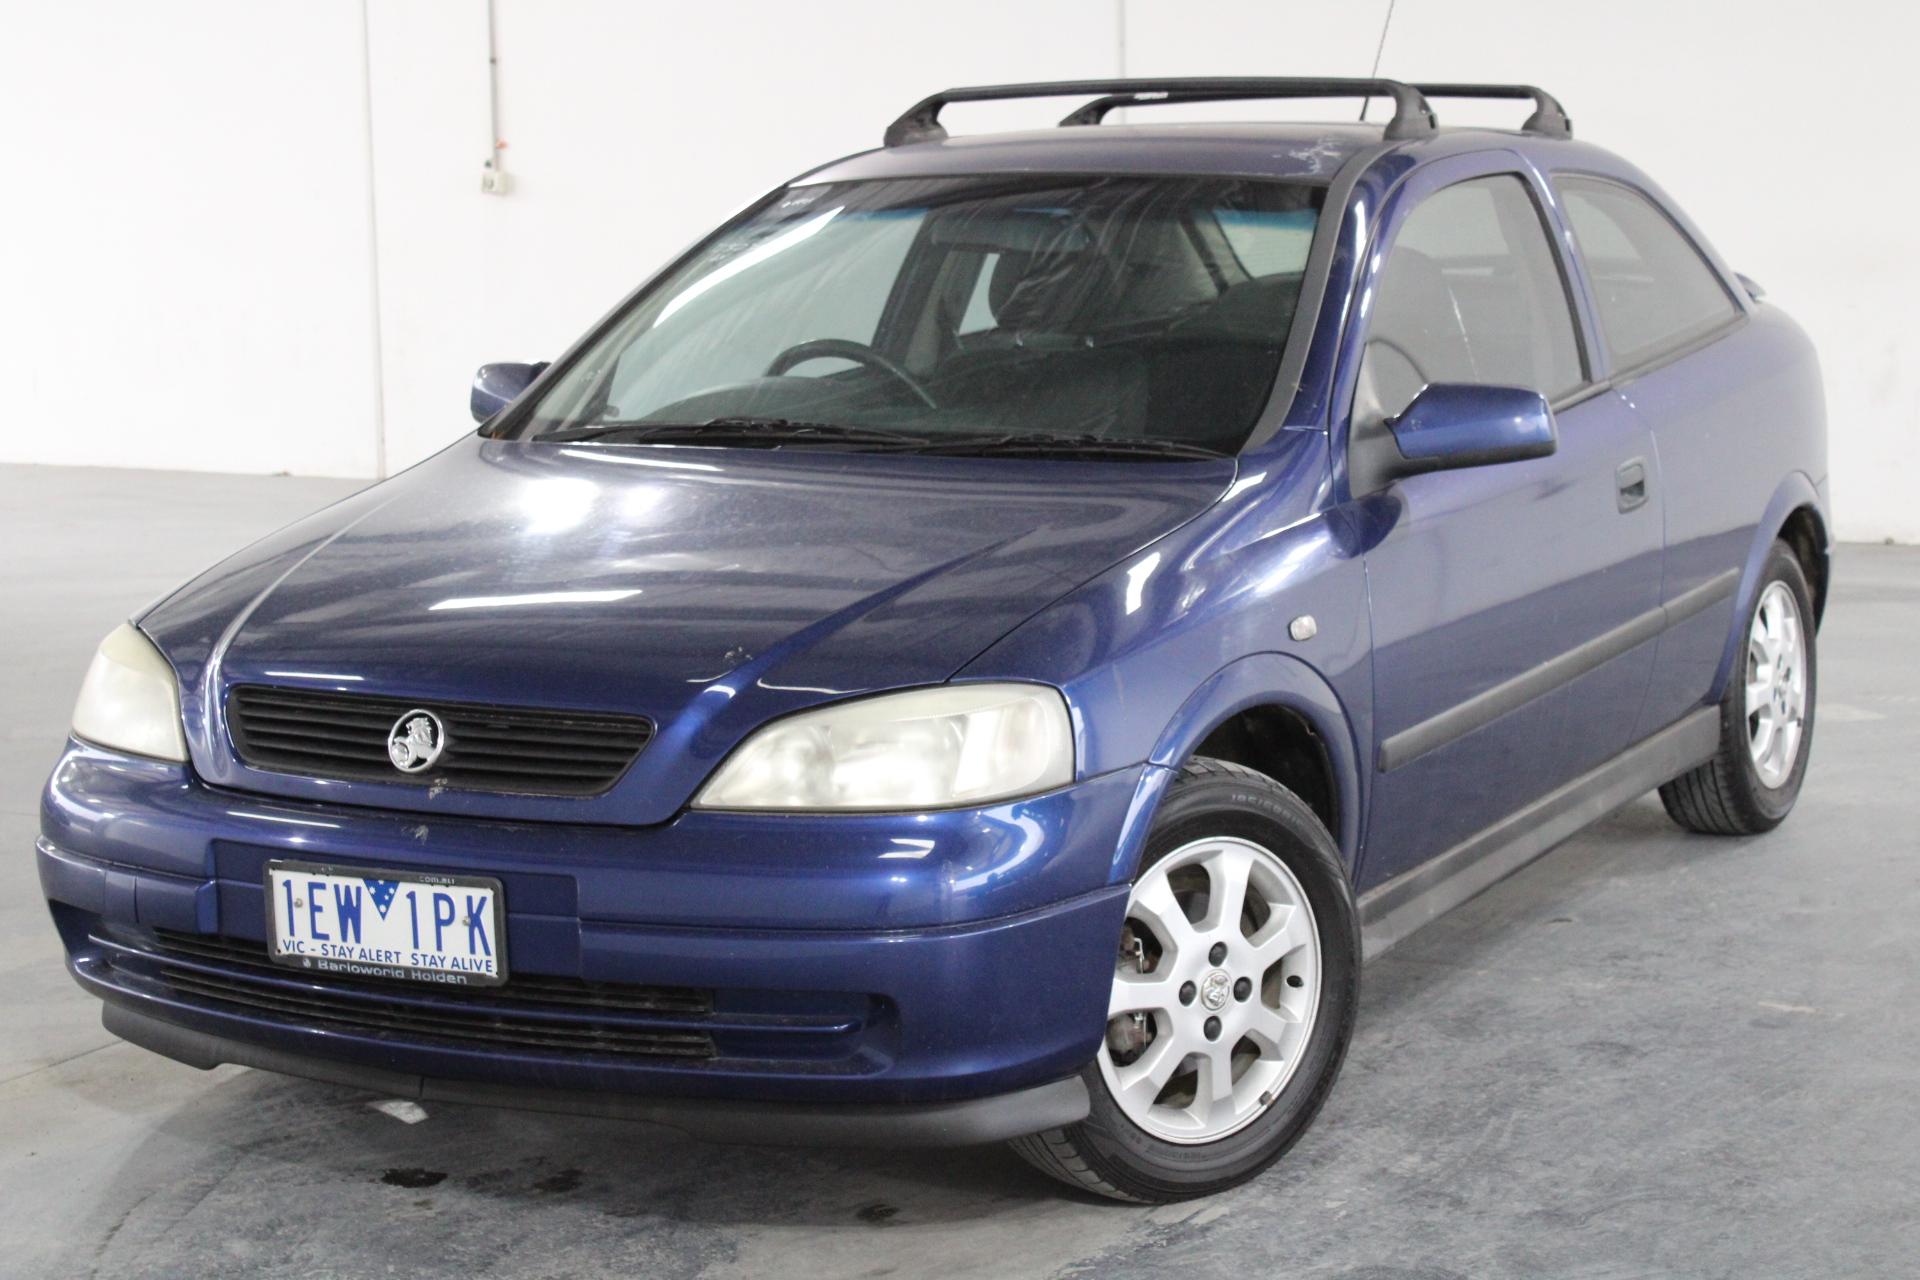 2004 Holden Astra SXi TS Manual Hatchback